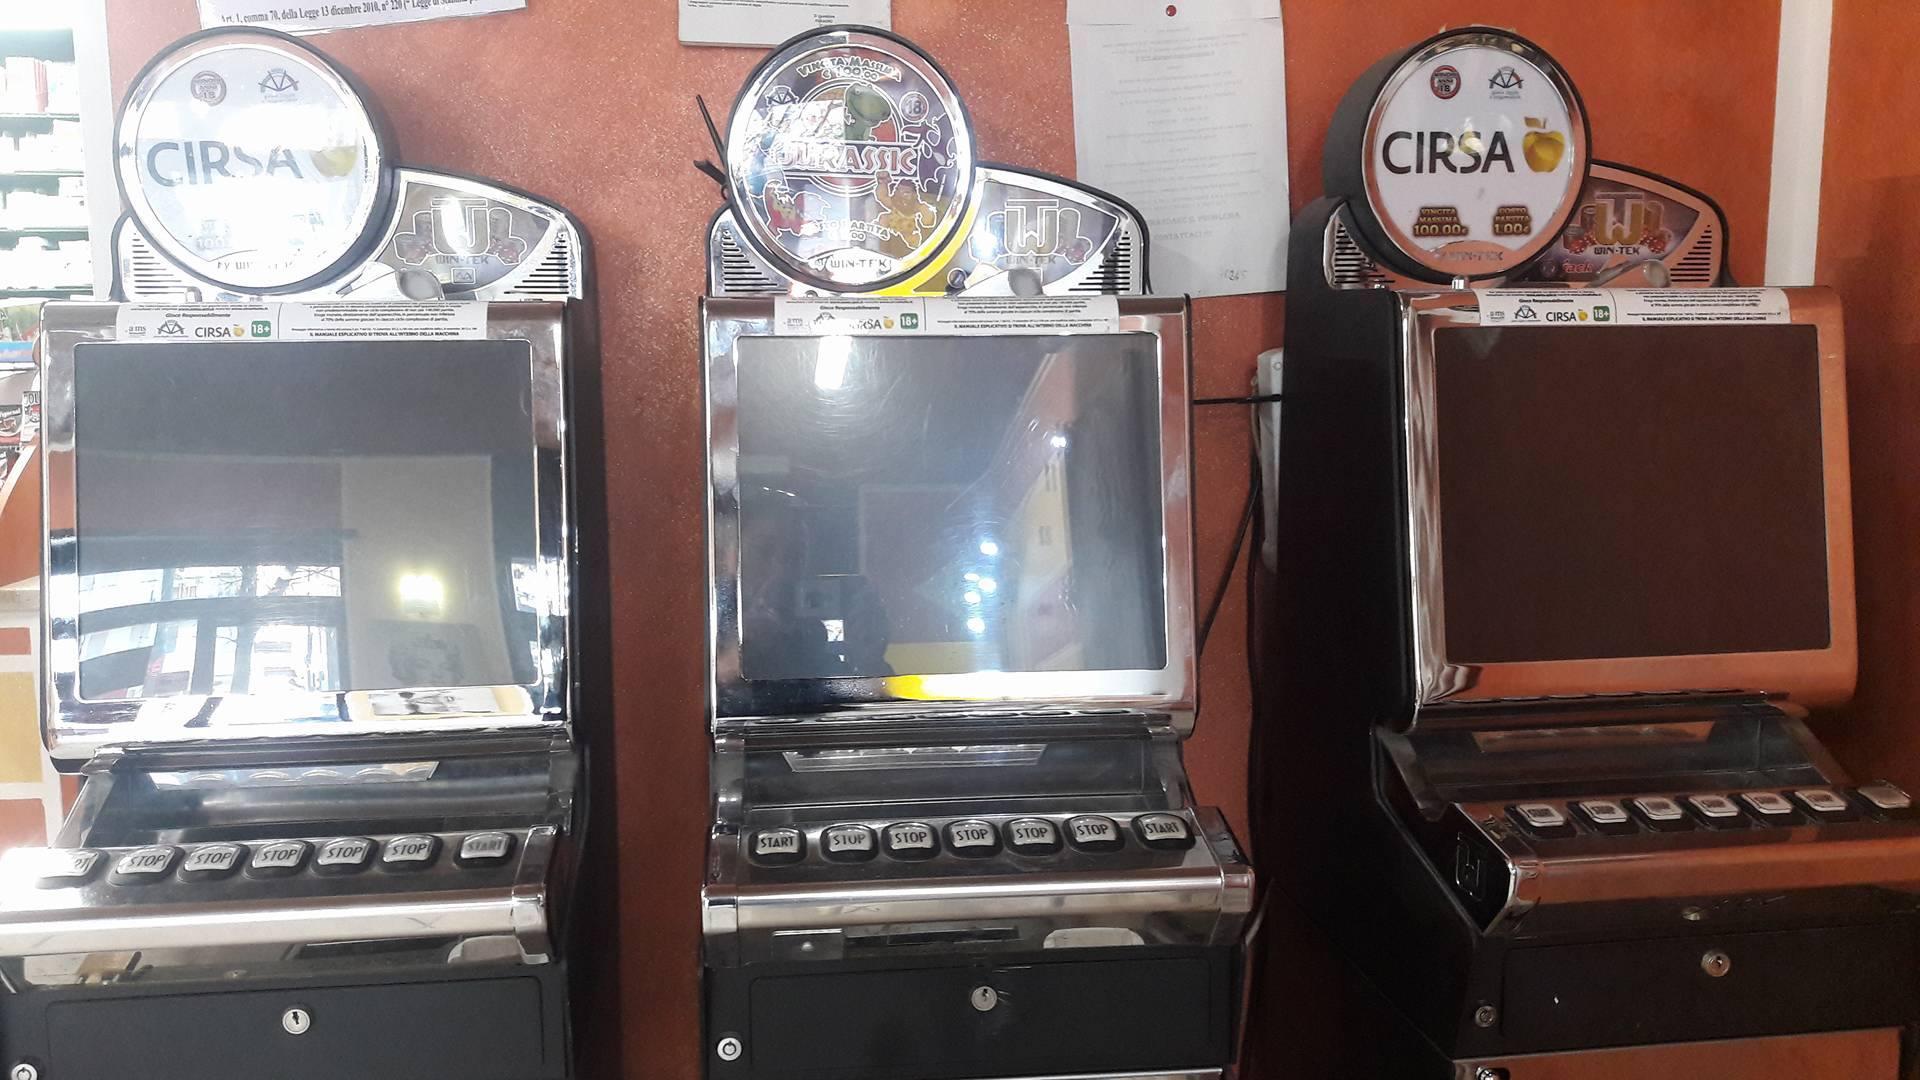 Legge sulle slot machine 2018